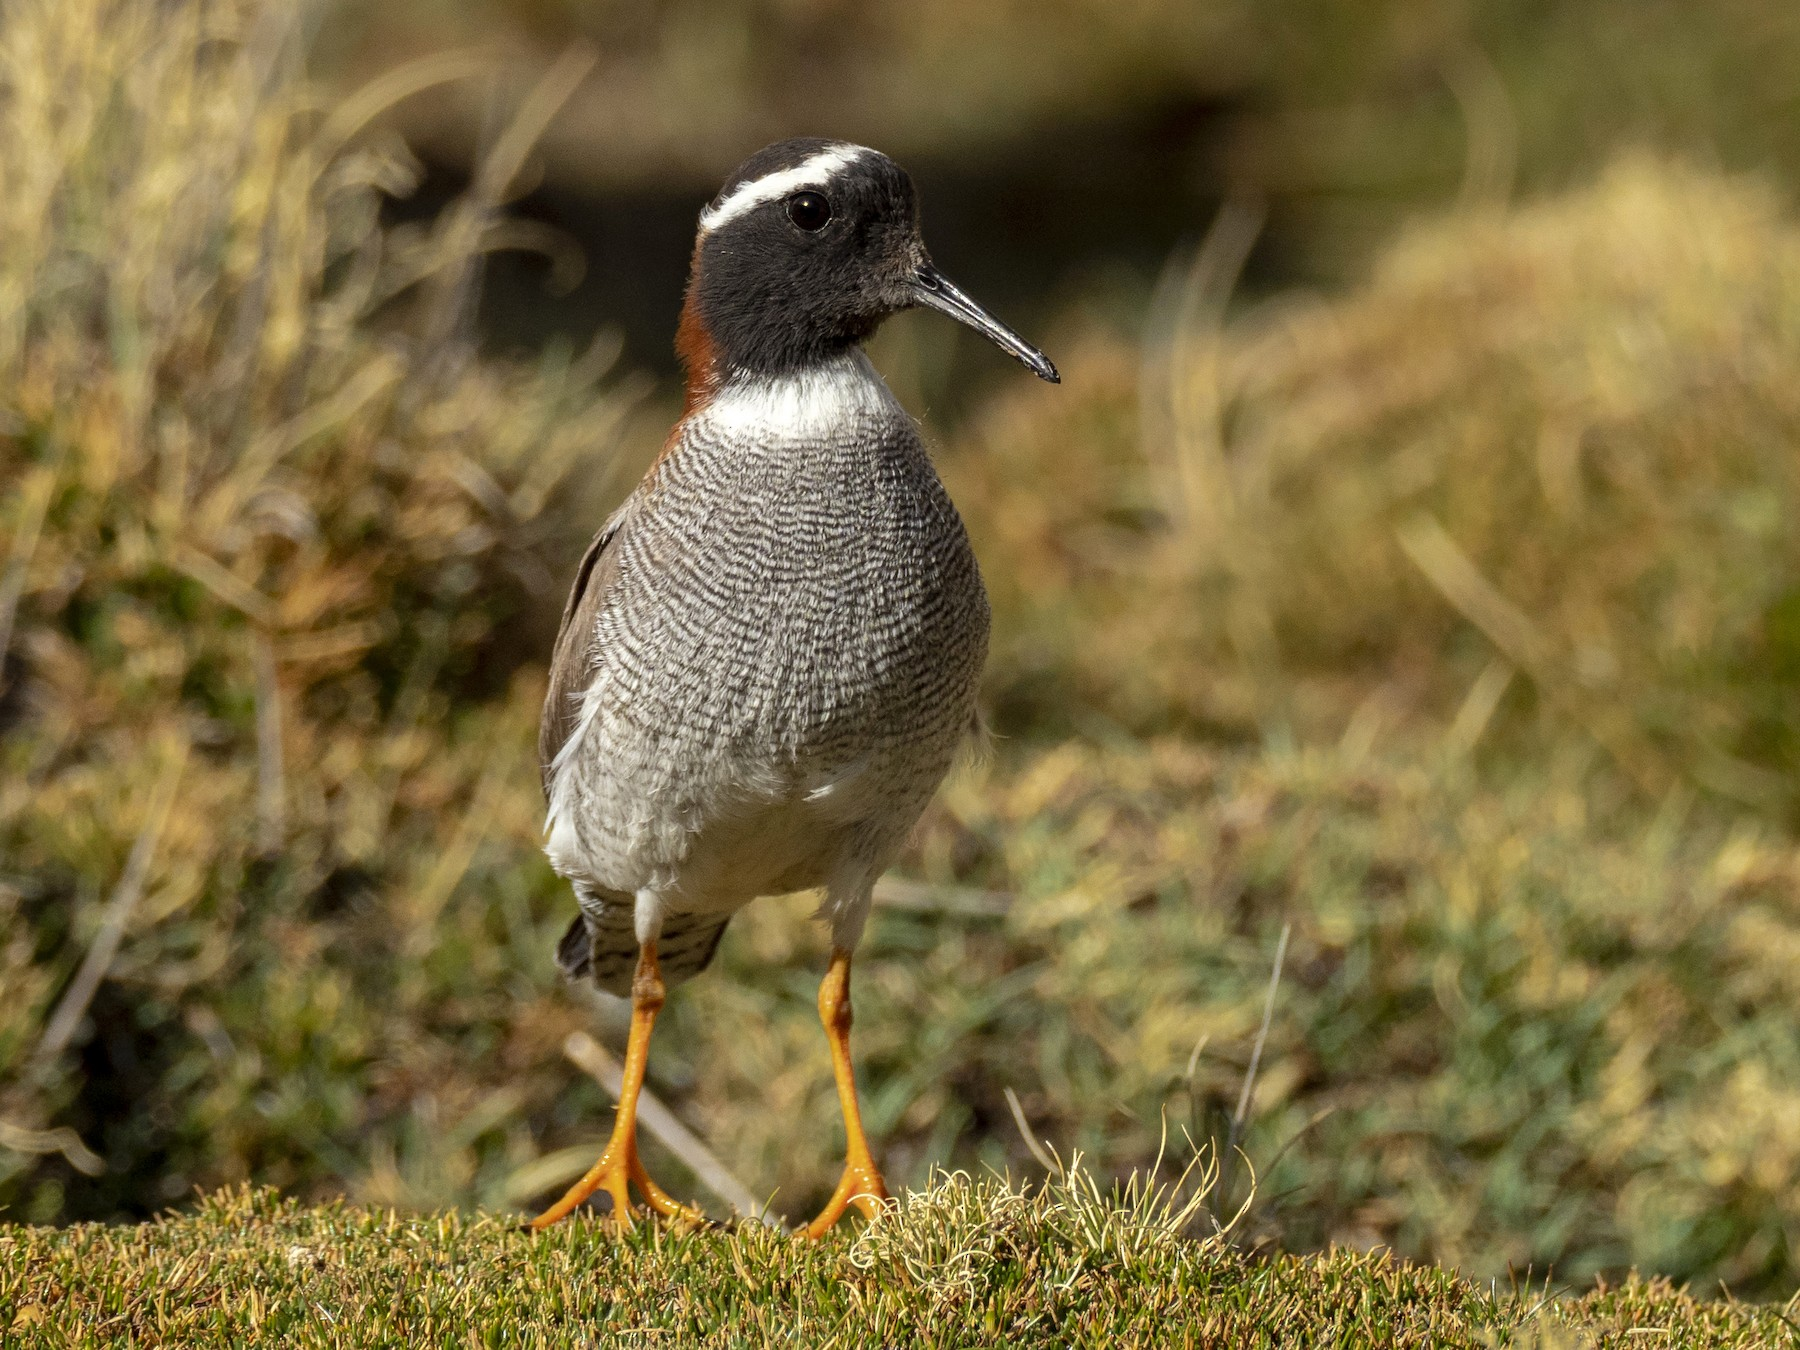 Diademed Sandpiper-Plover - Andres Vasquez Tropical Birding Tours